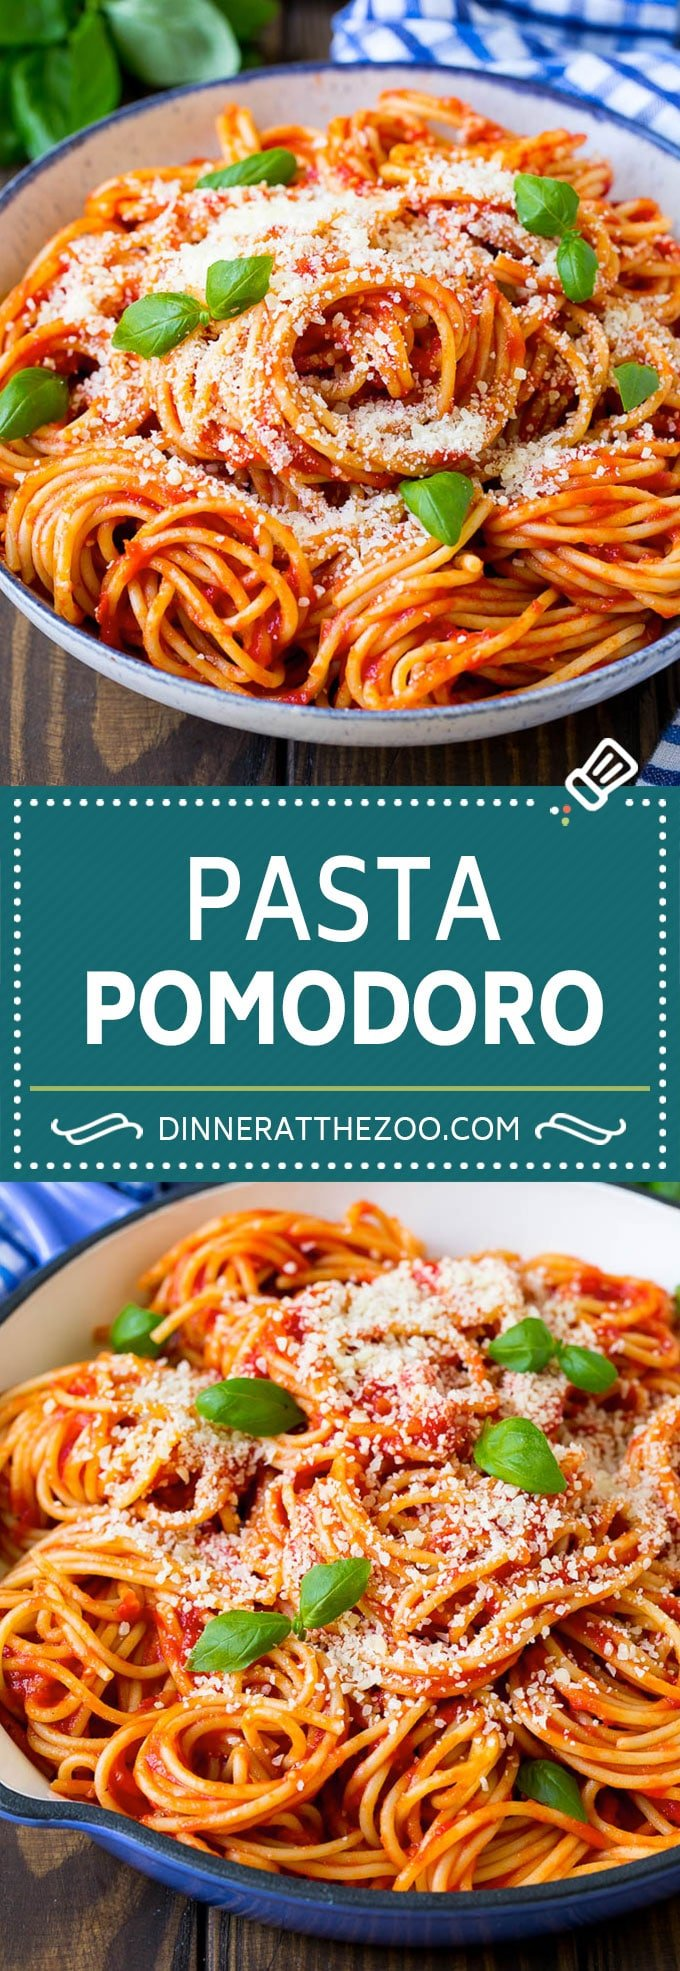 Pasta Pomodoro Recipe | Spaghetti Recipe | Homemade Tomato Sauce #pasta #spaghetti #tomatoes #basil #italianfood #dinner #dinneratthezoo